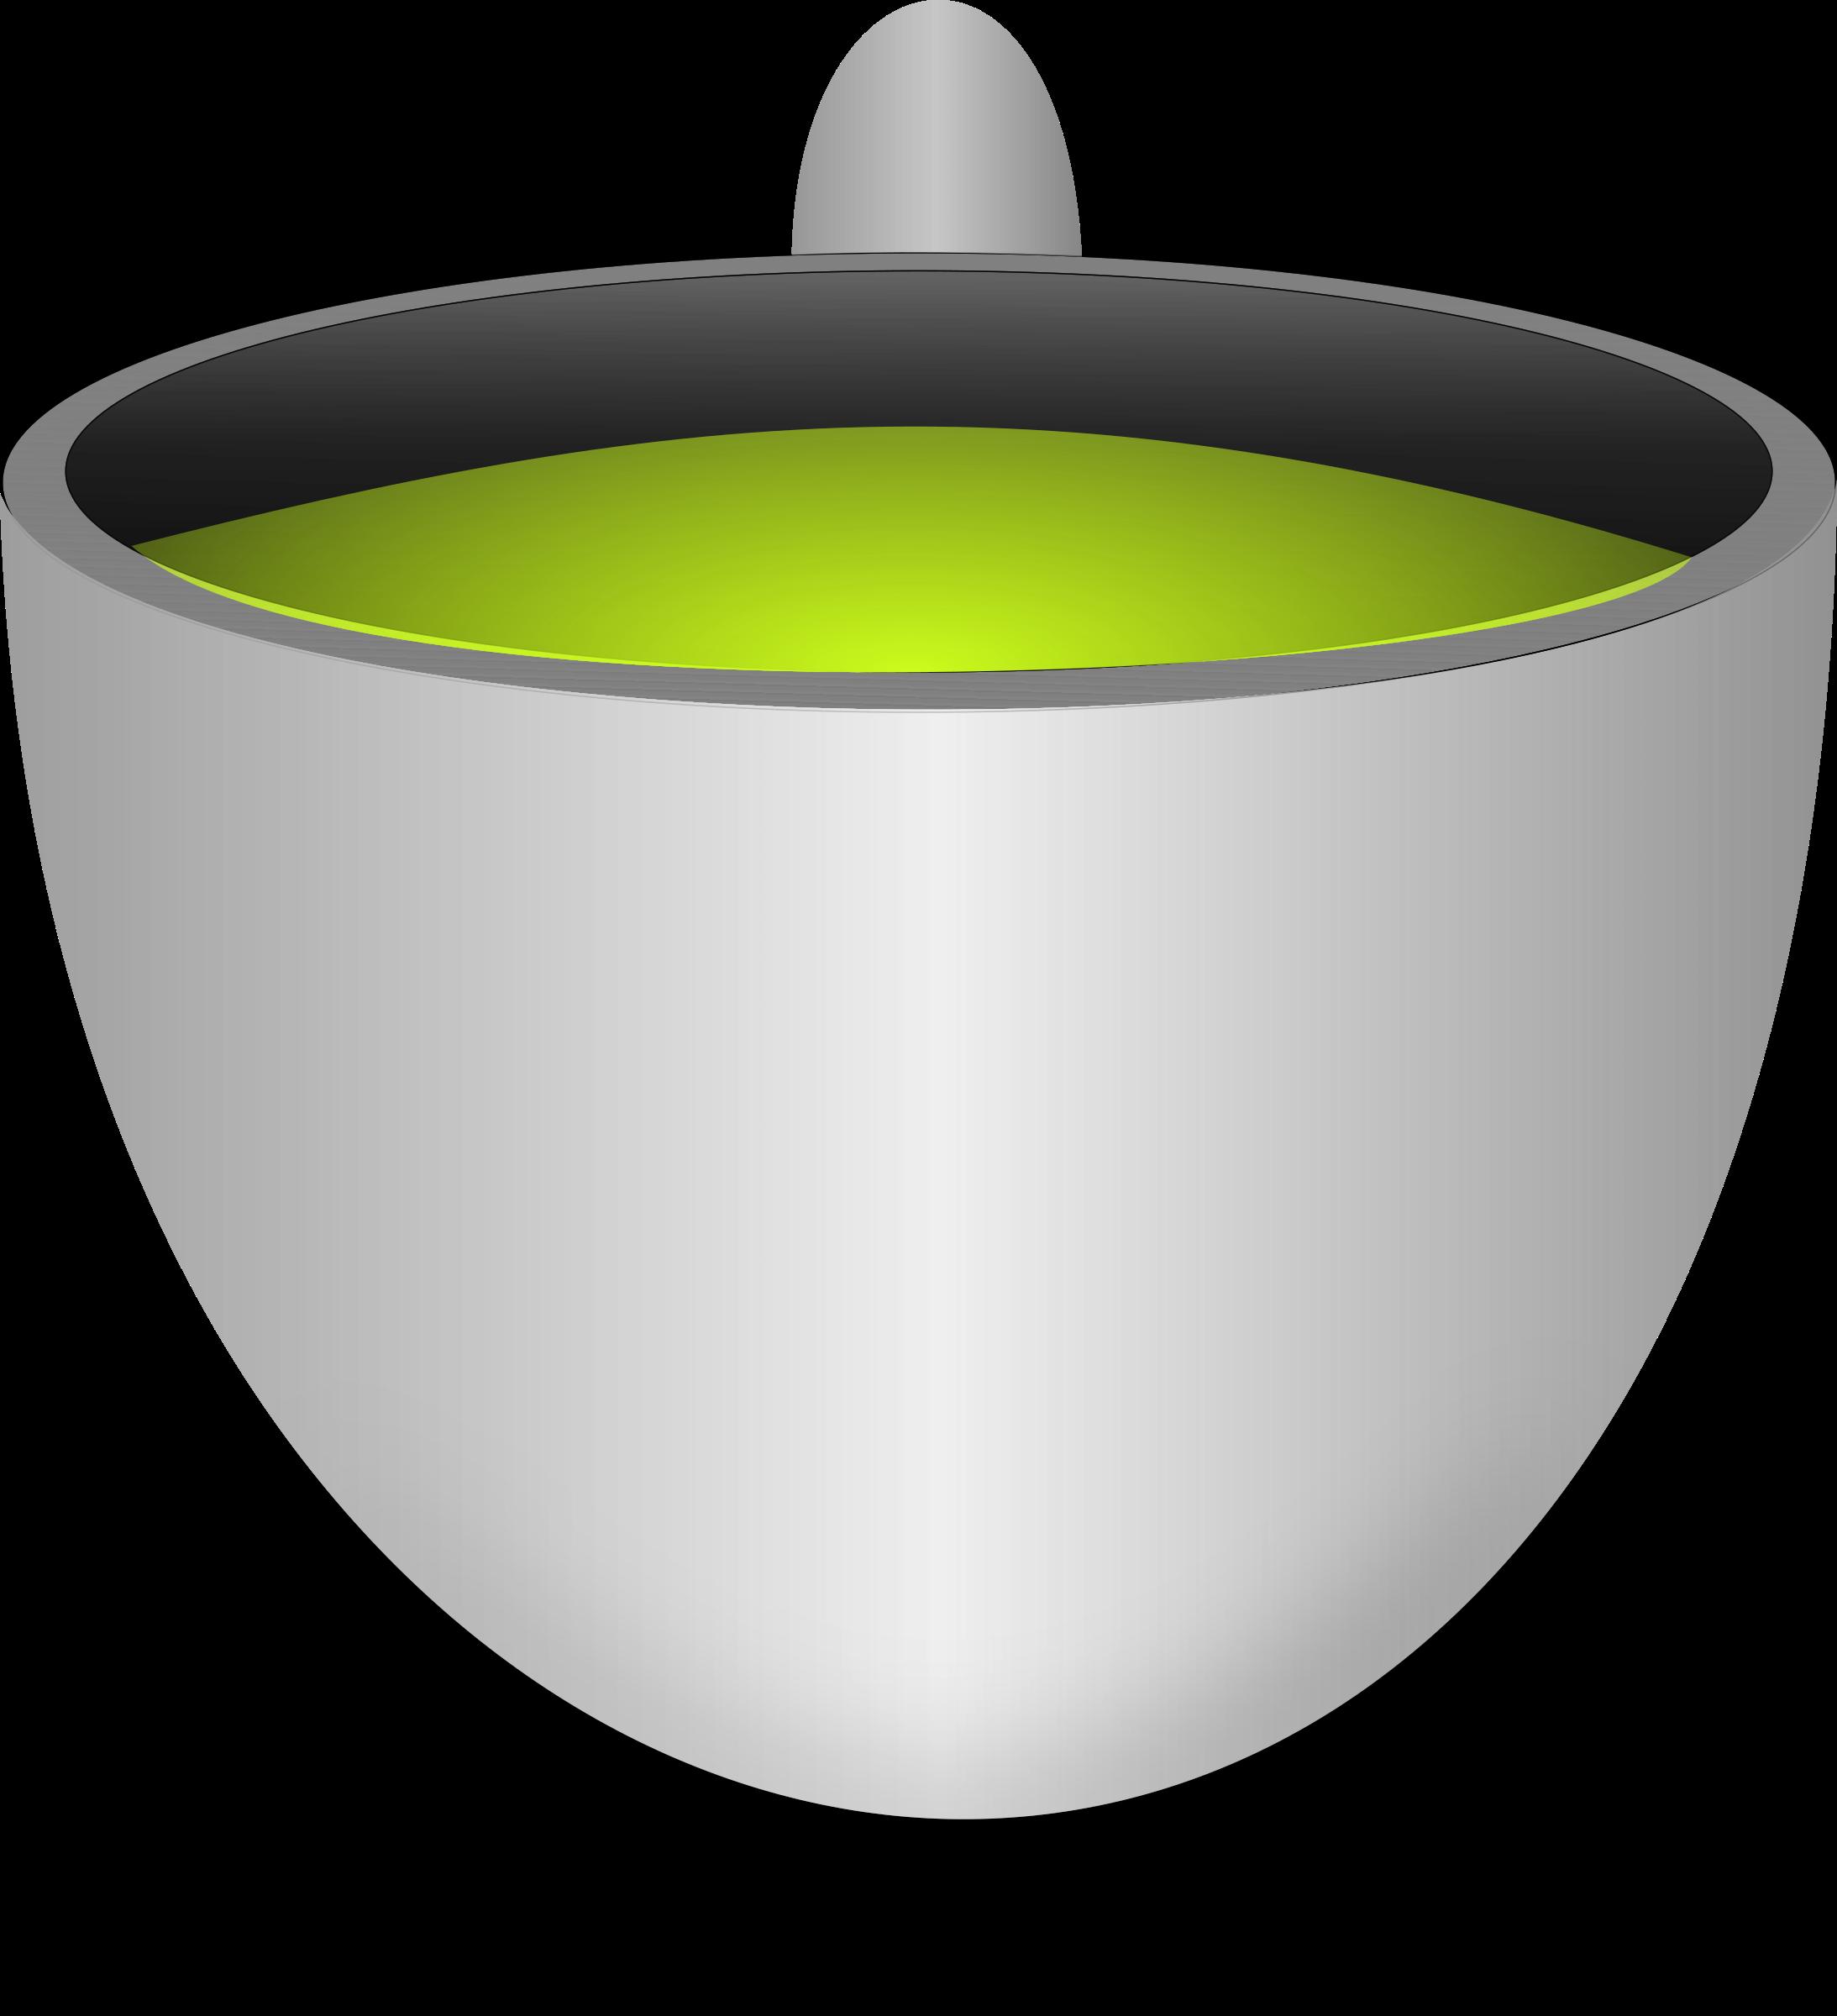 Teacup clipart green tea Cup Clipart Green Tea Tea